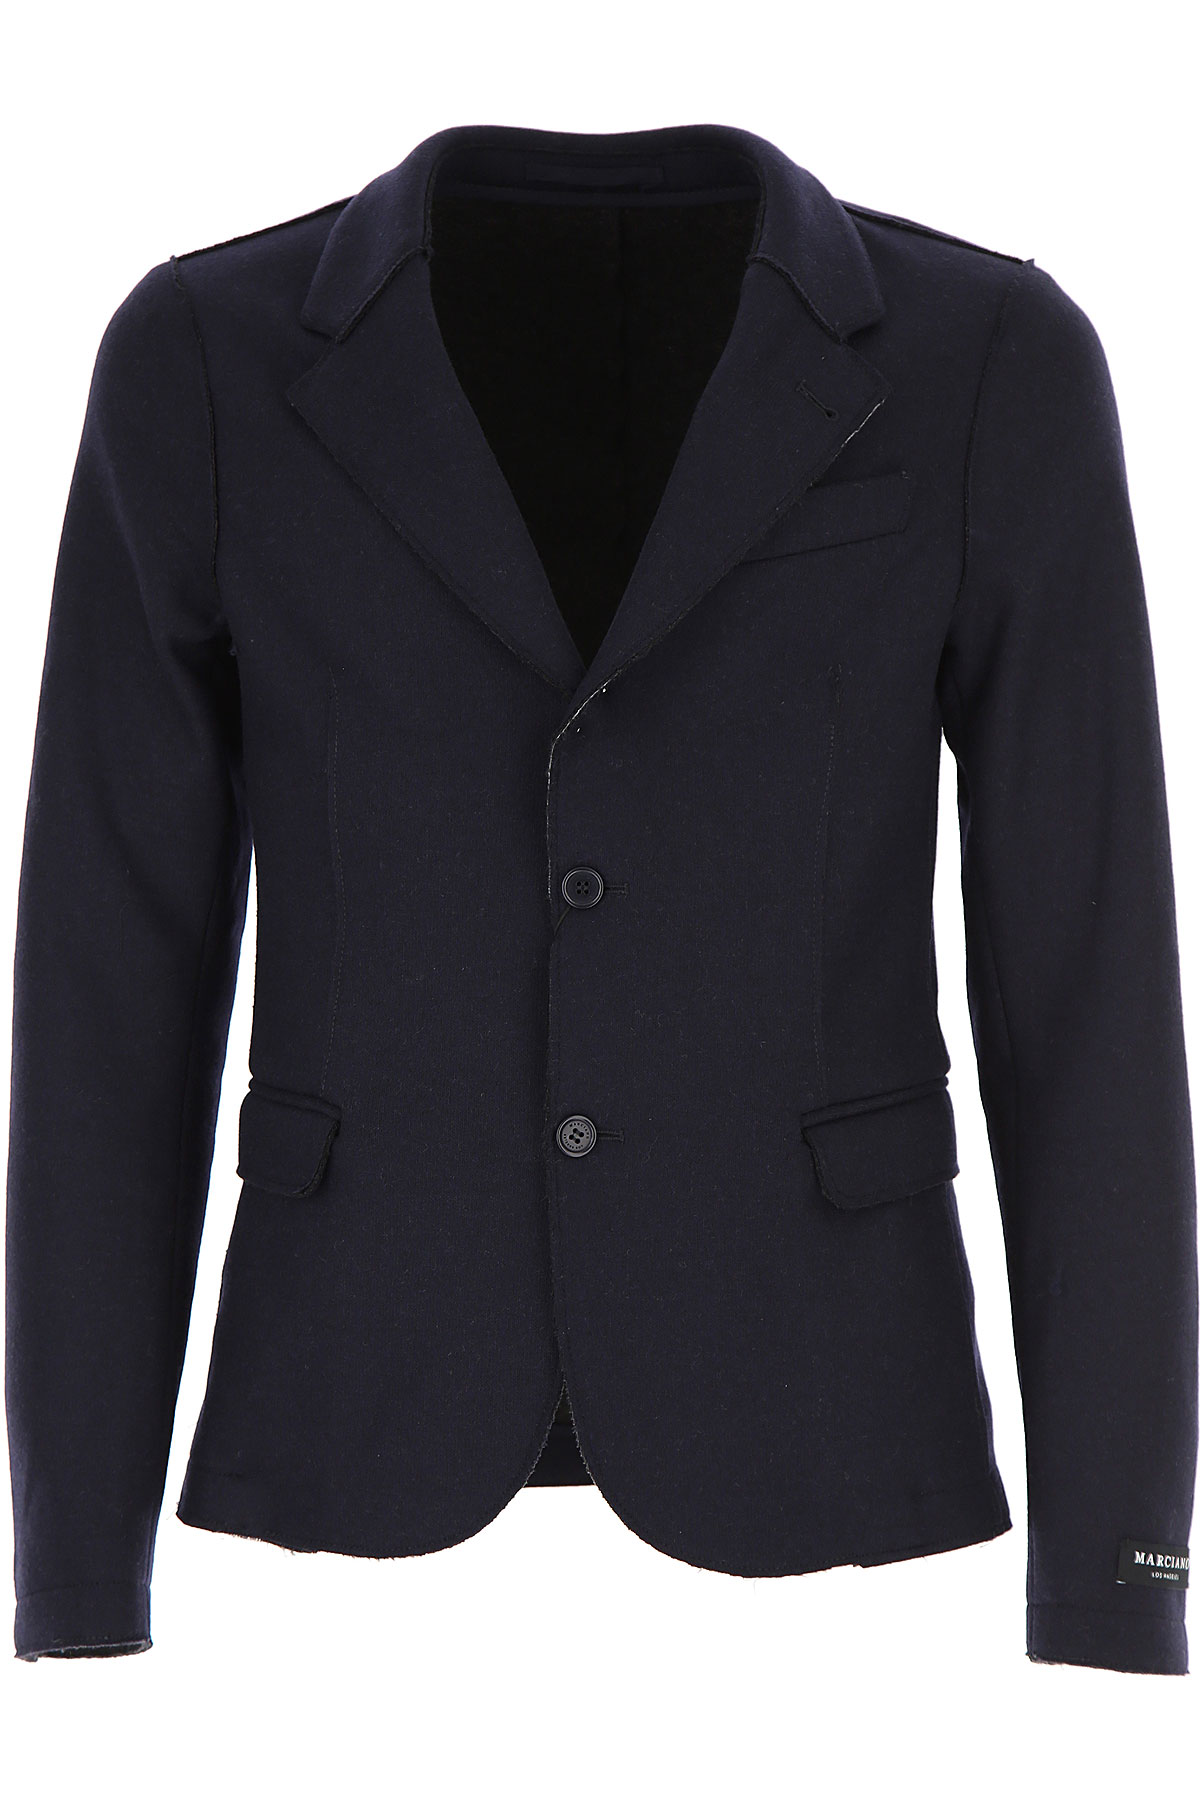 Image of Guess Blazer for Men, Sport Coat, Dark Blue, Wool, 2017, L M XL